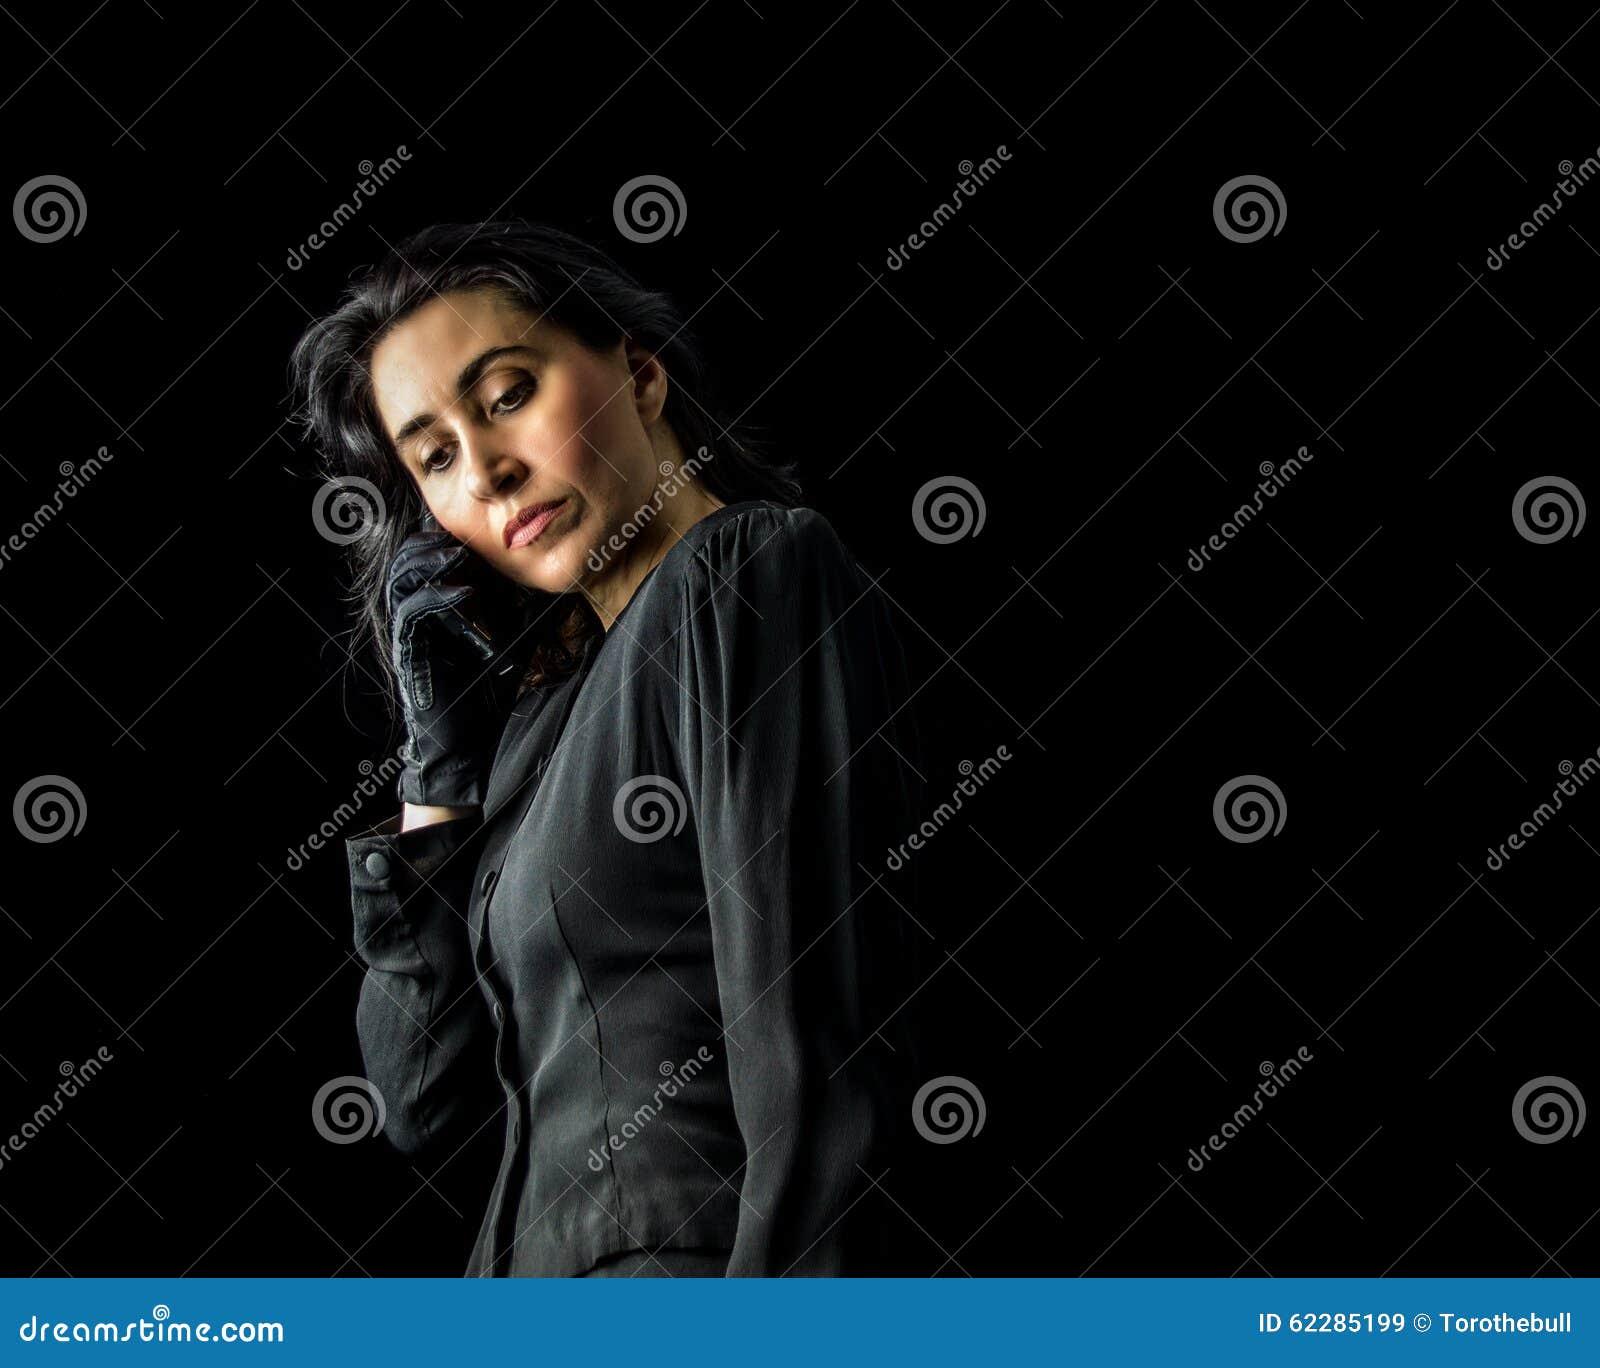 ec61b6eba Woman In Black Using Cell Phone Stock Image - Image of gloves, dress ...